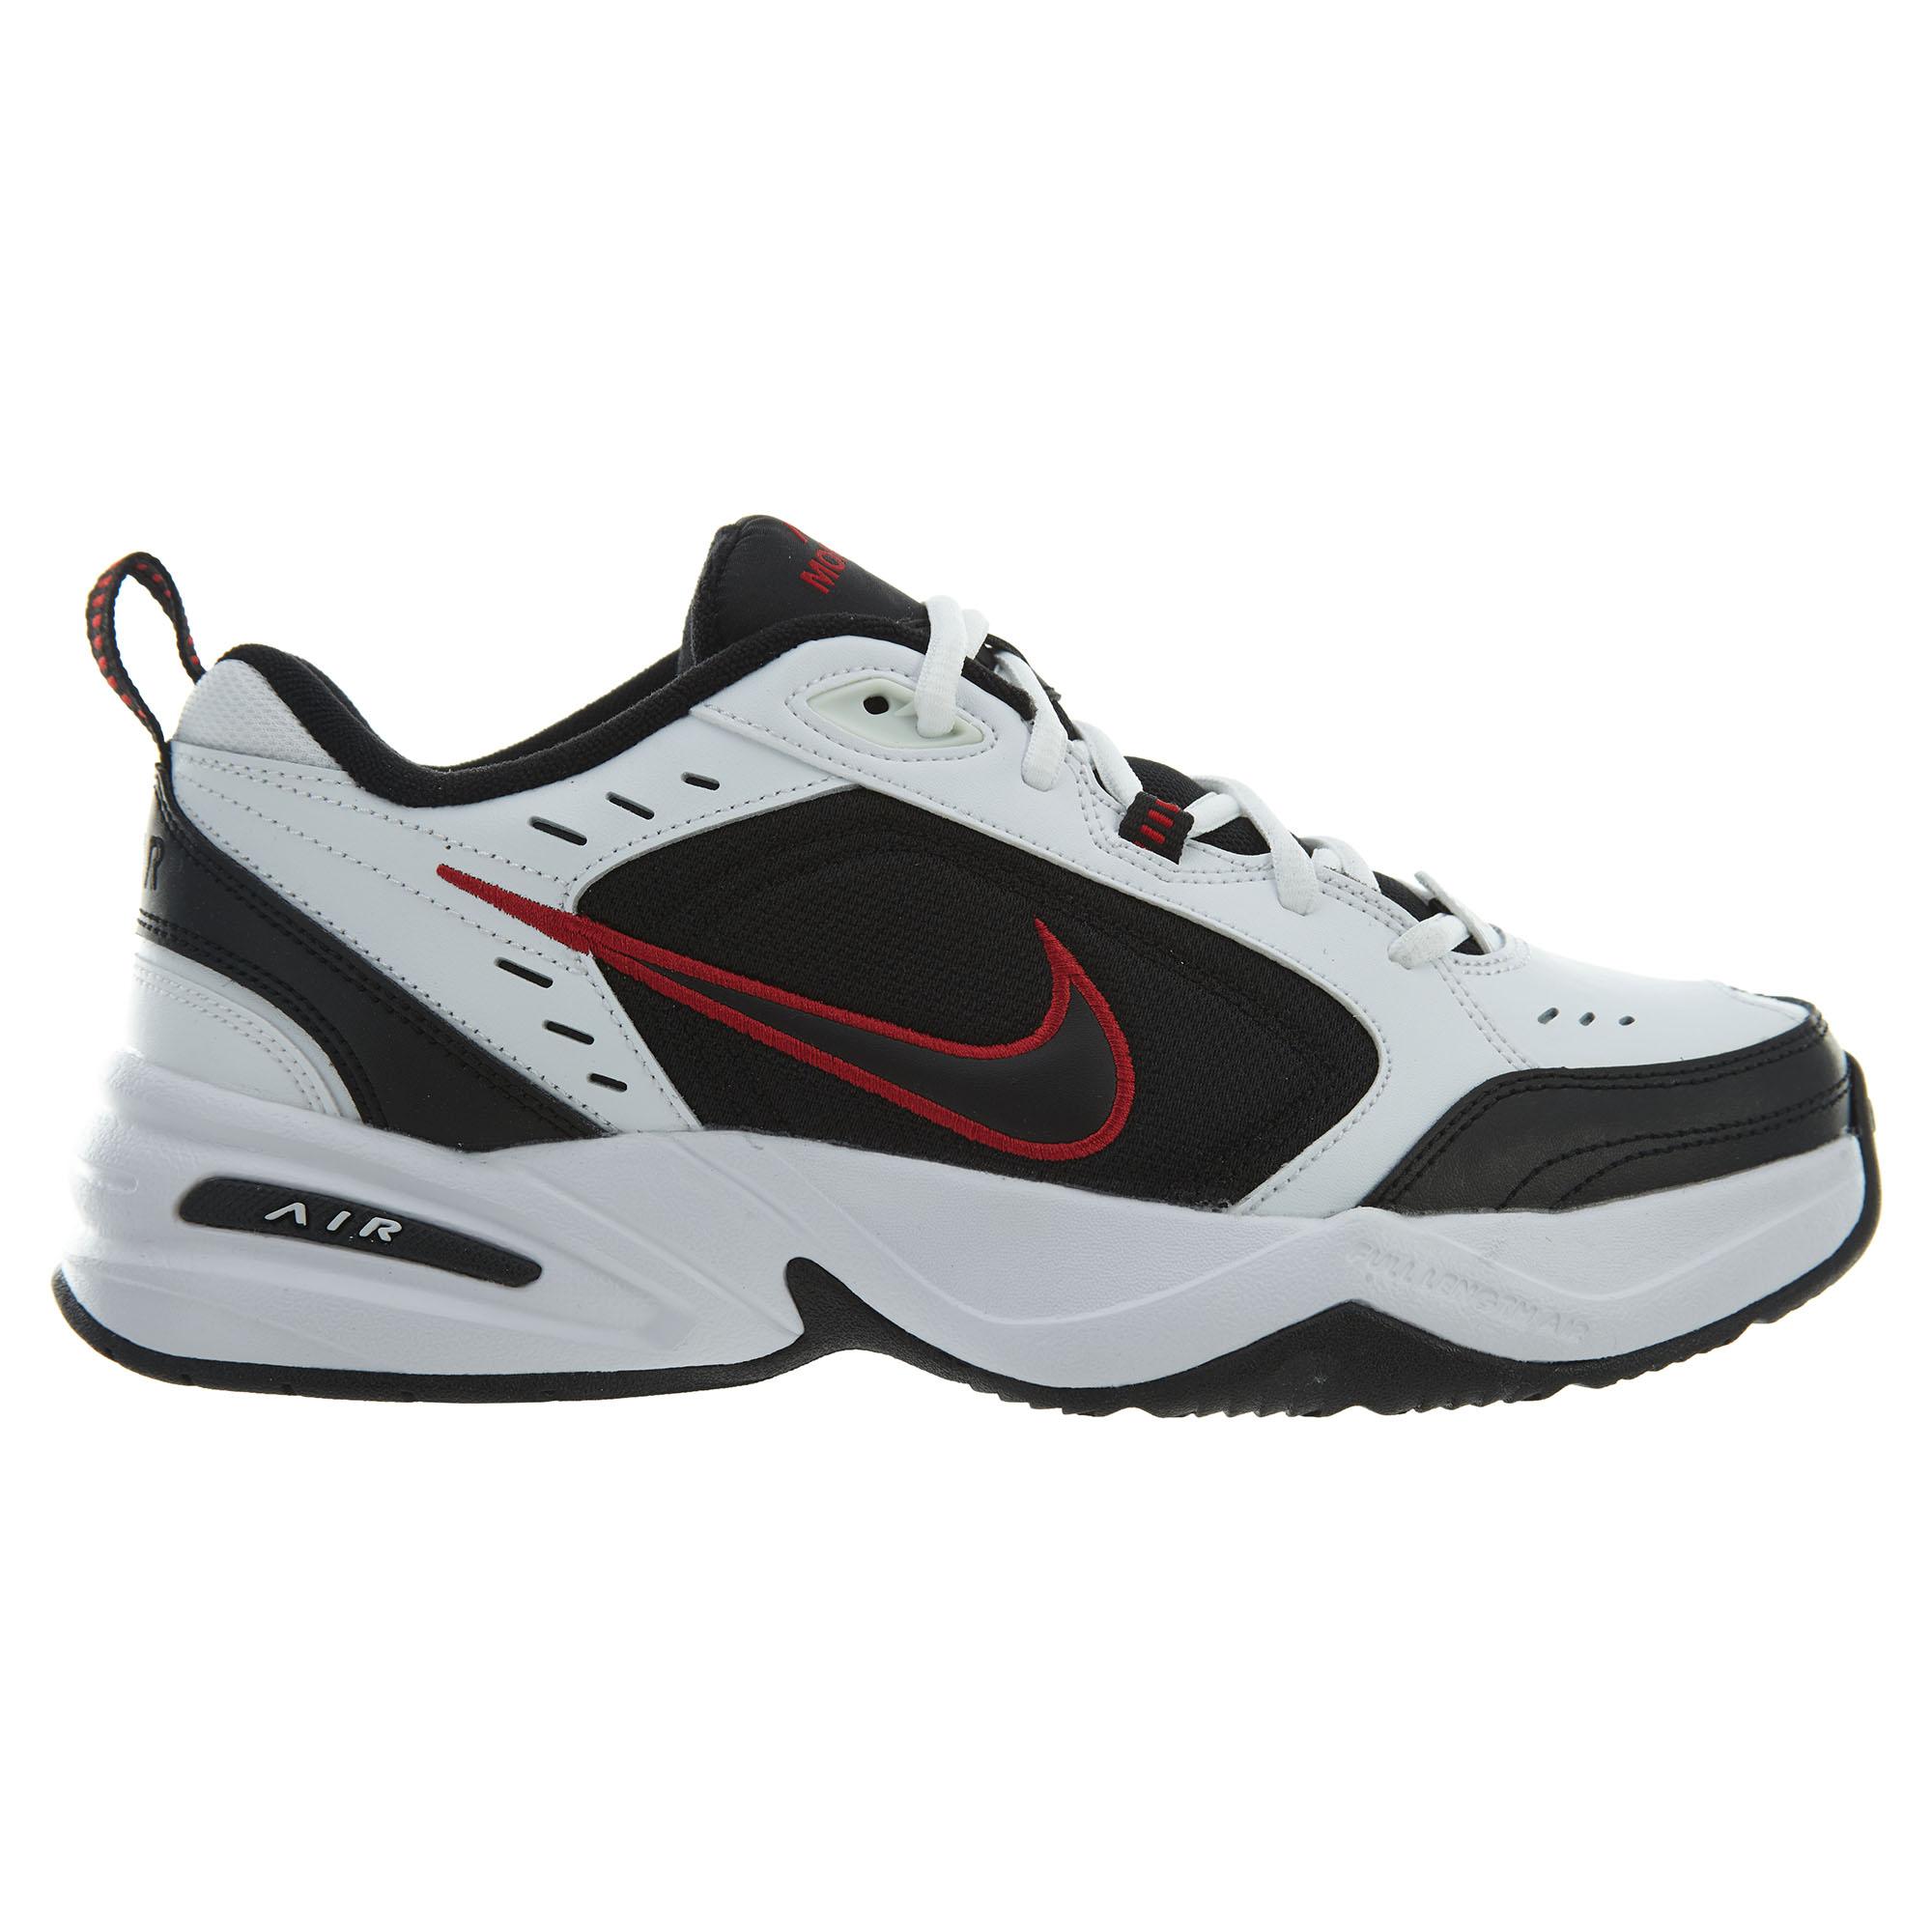 Nike Air Monarch Iv 415445 White/Black Varsity Red 415445 101